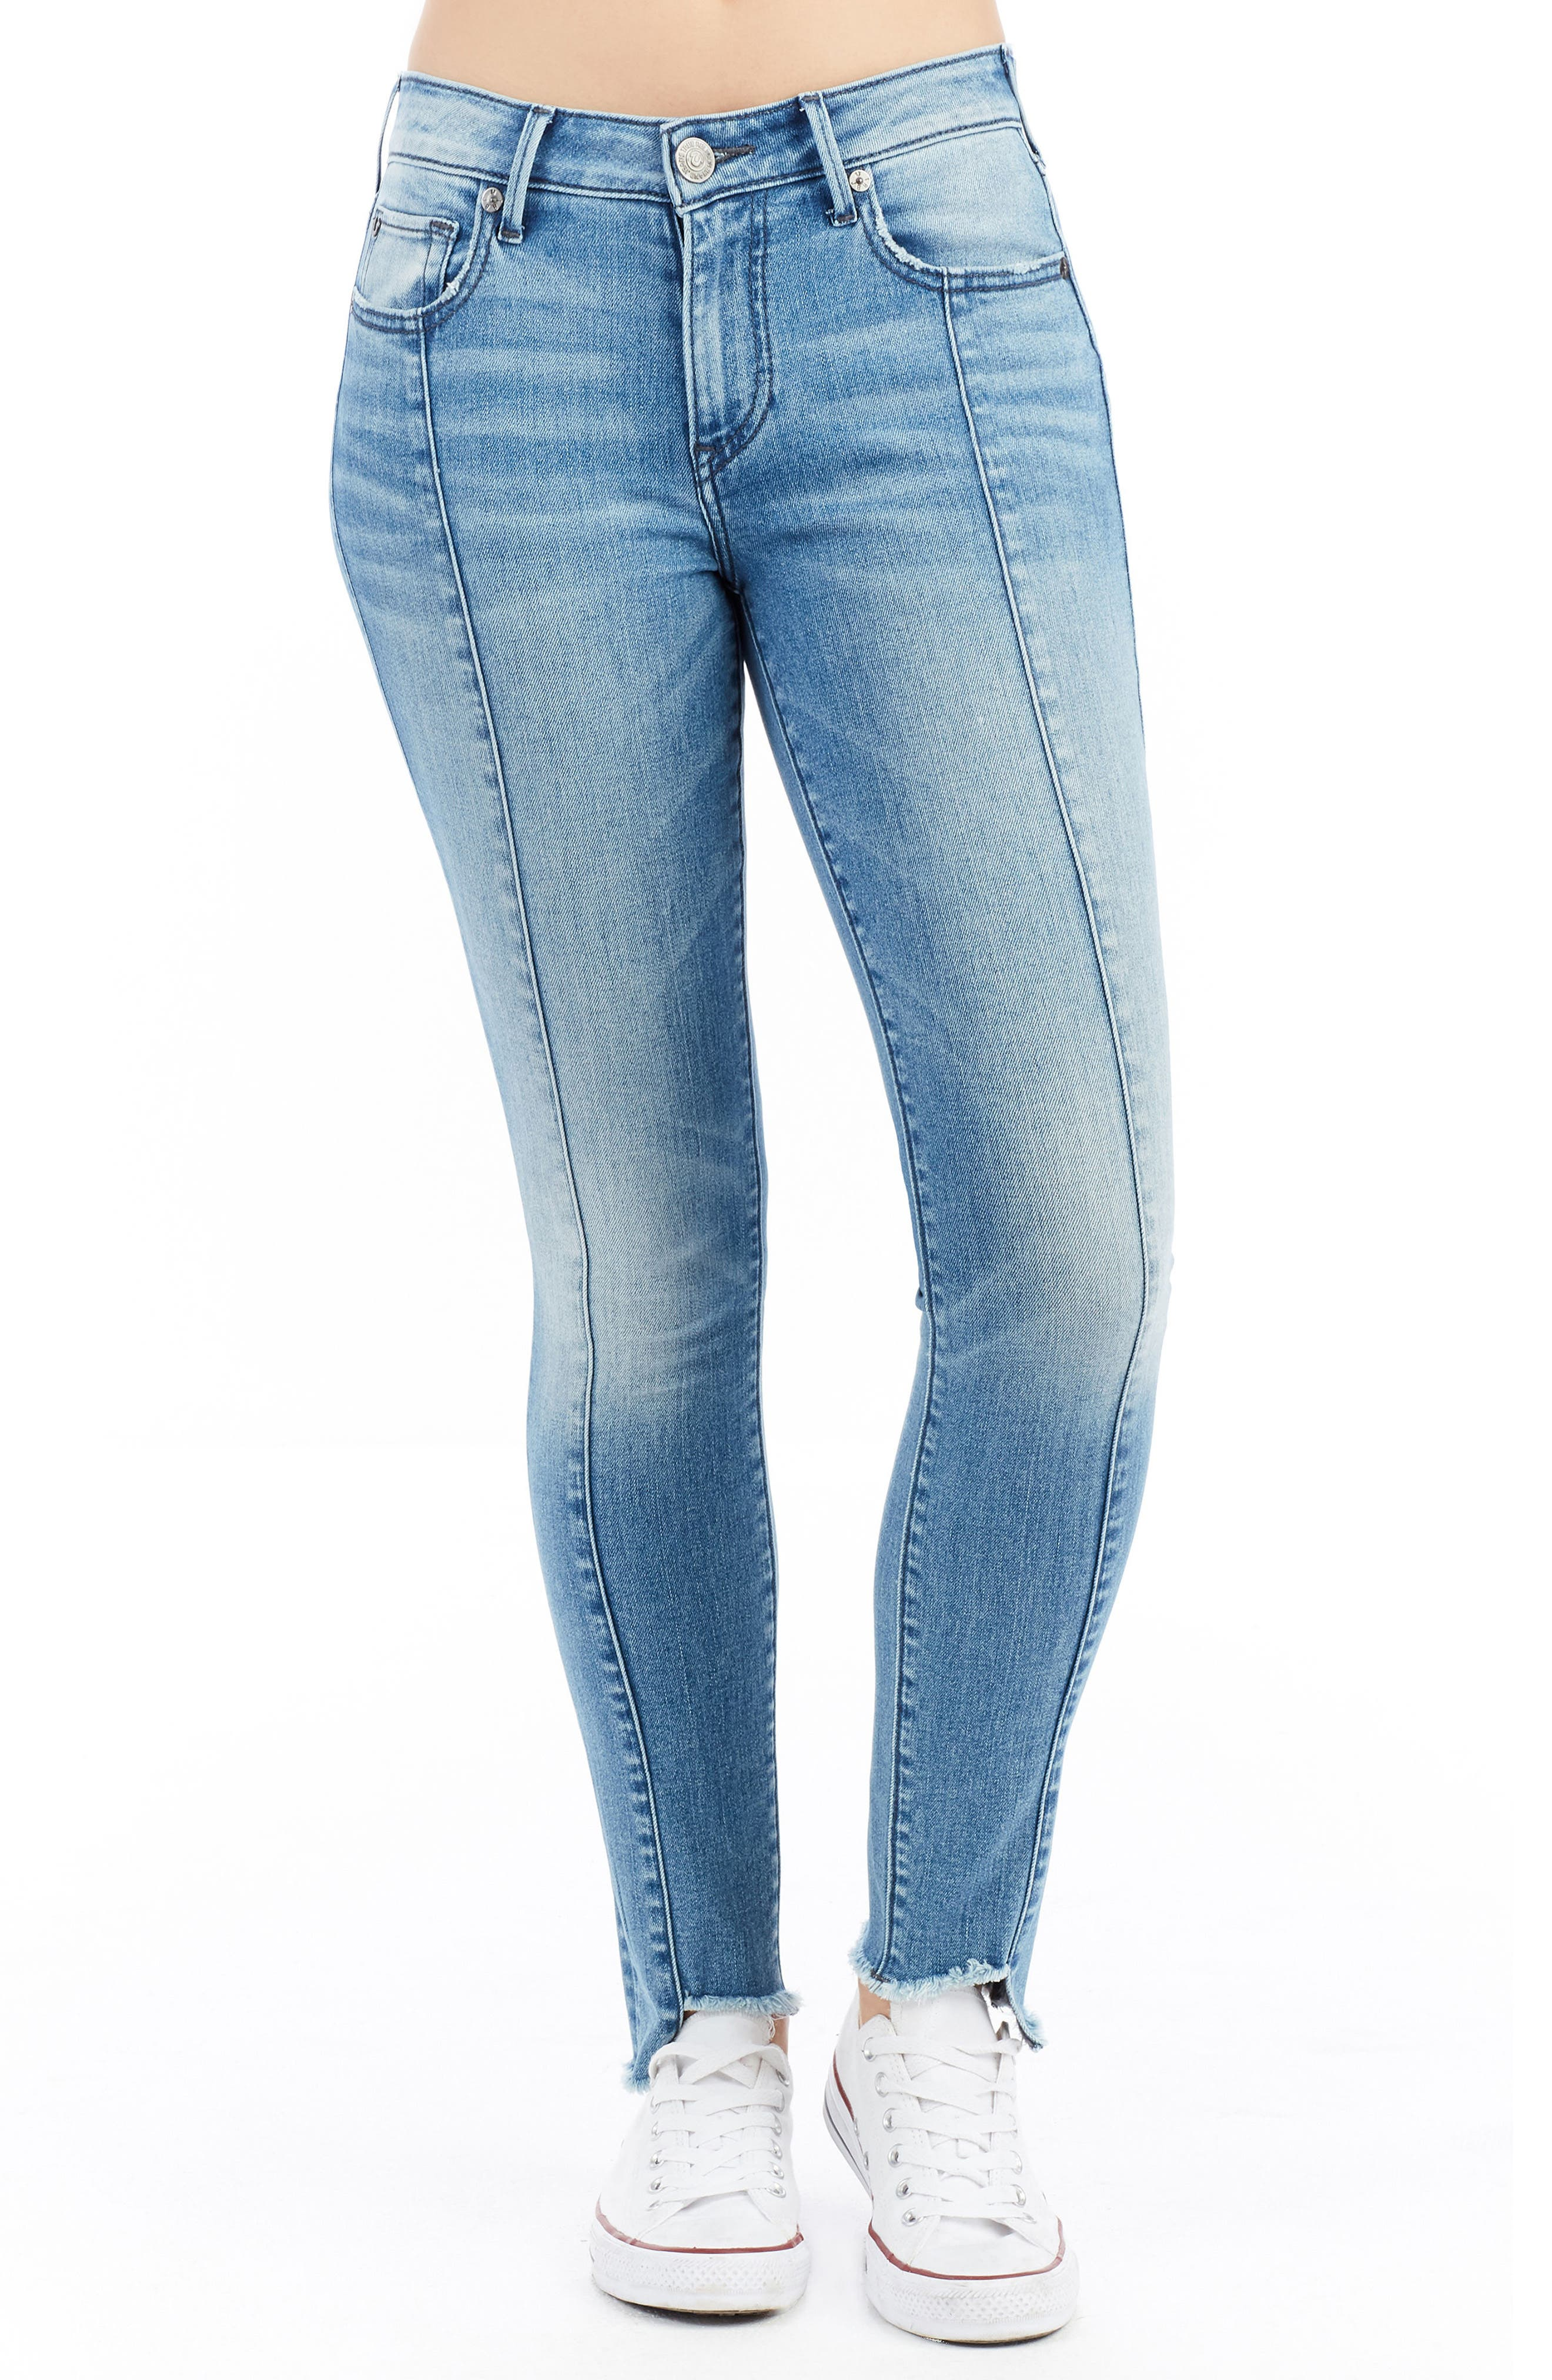 True Religion Brand Jeans Jennie Curvy Ankle Skinny Jeans (Island Fever)